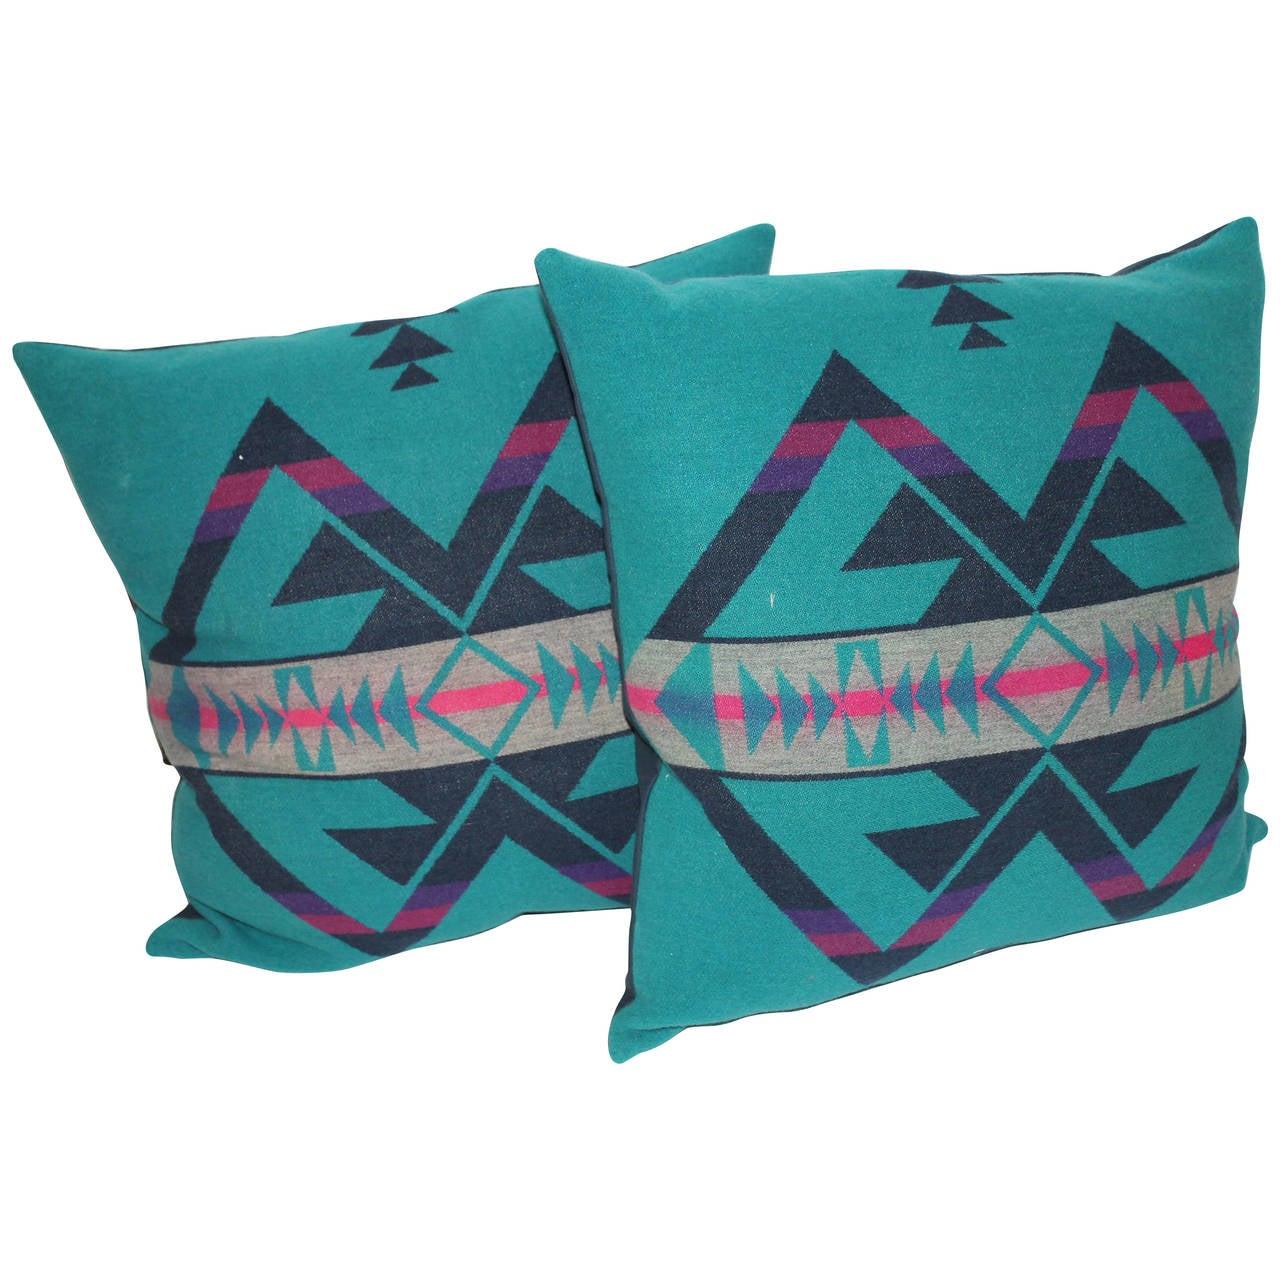 Pair of Amazing Cayuse Pendleton Indian Blanket Pillows